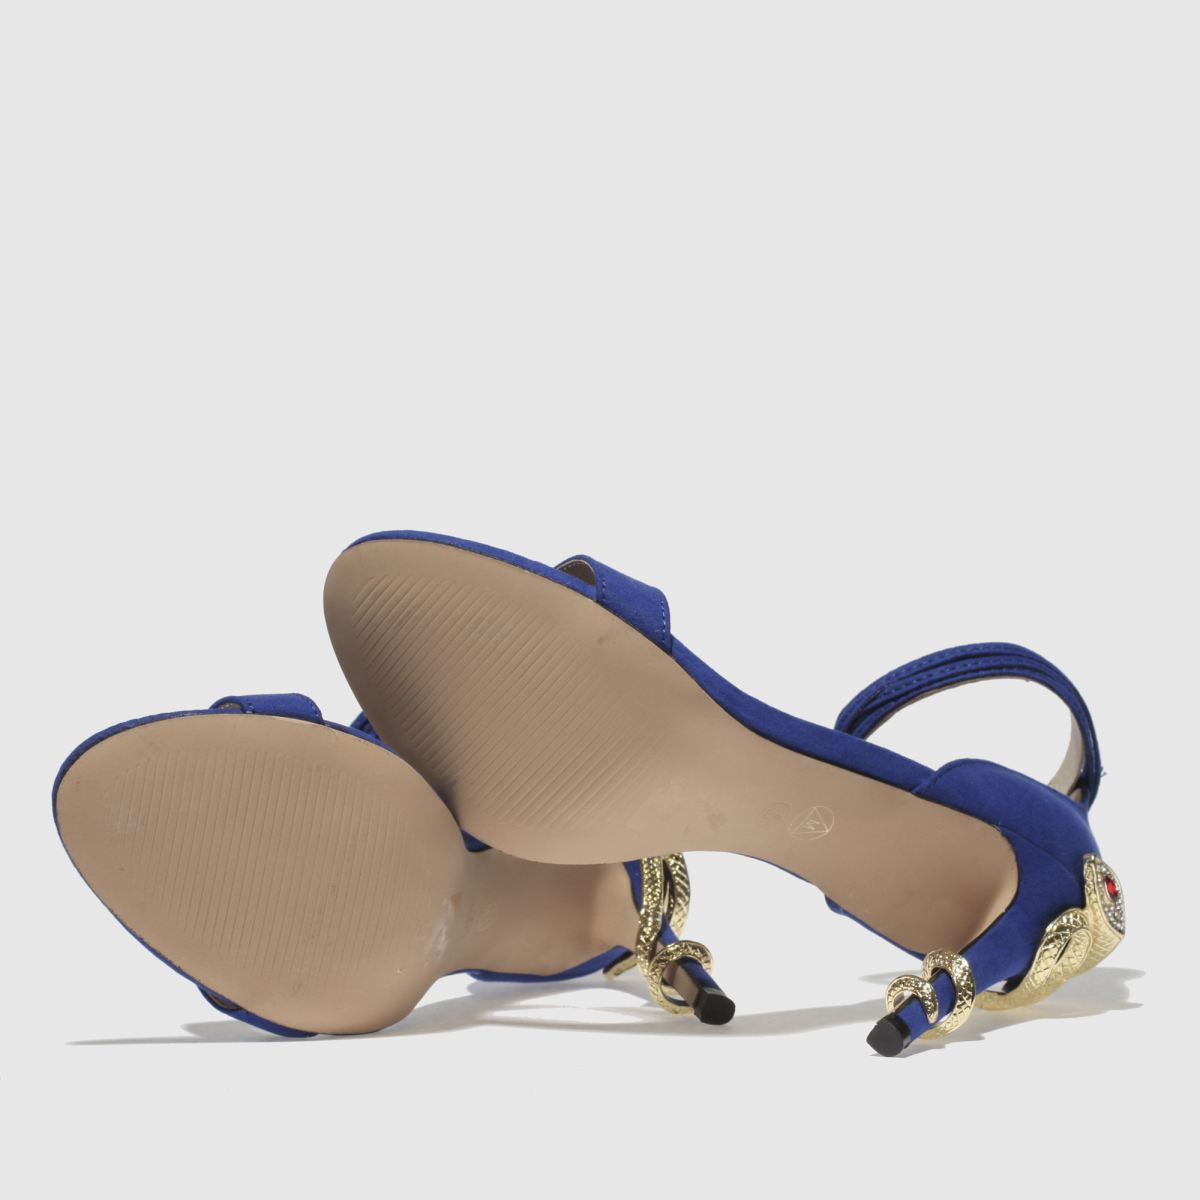 Damen Blau-gold missguided Barely There Snake Gute High Heels | schuh Gute Snake Qualität beliebte Schuhe ed238c